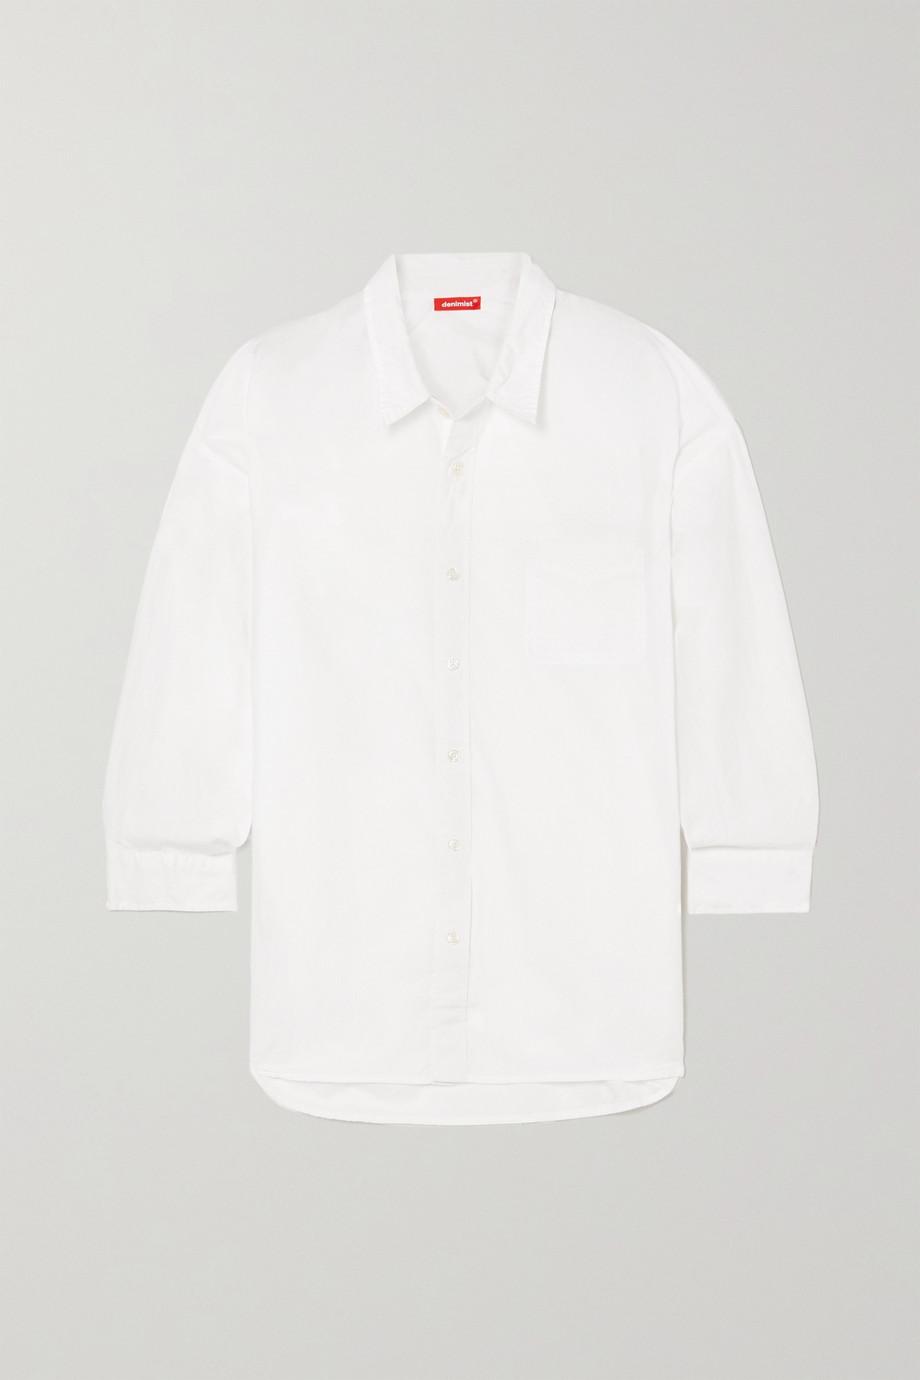 Denimist 纯棉府绸衬衫